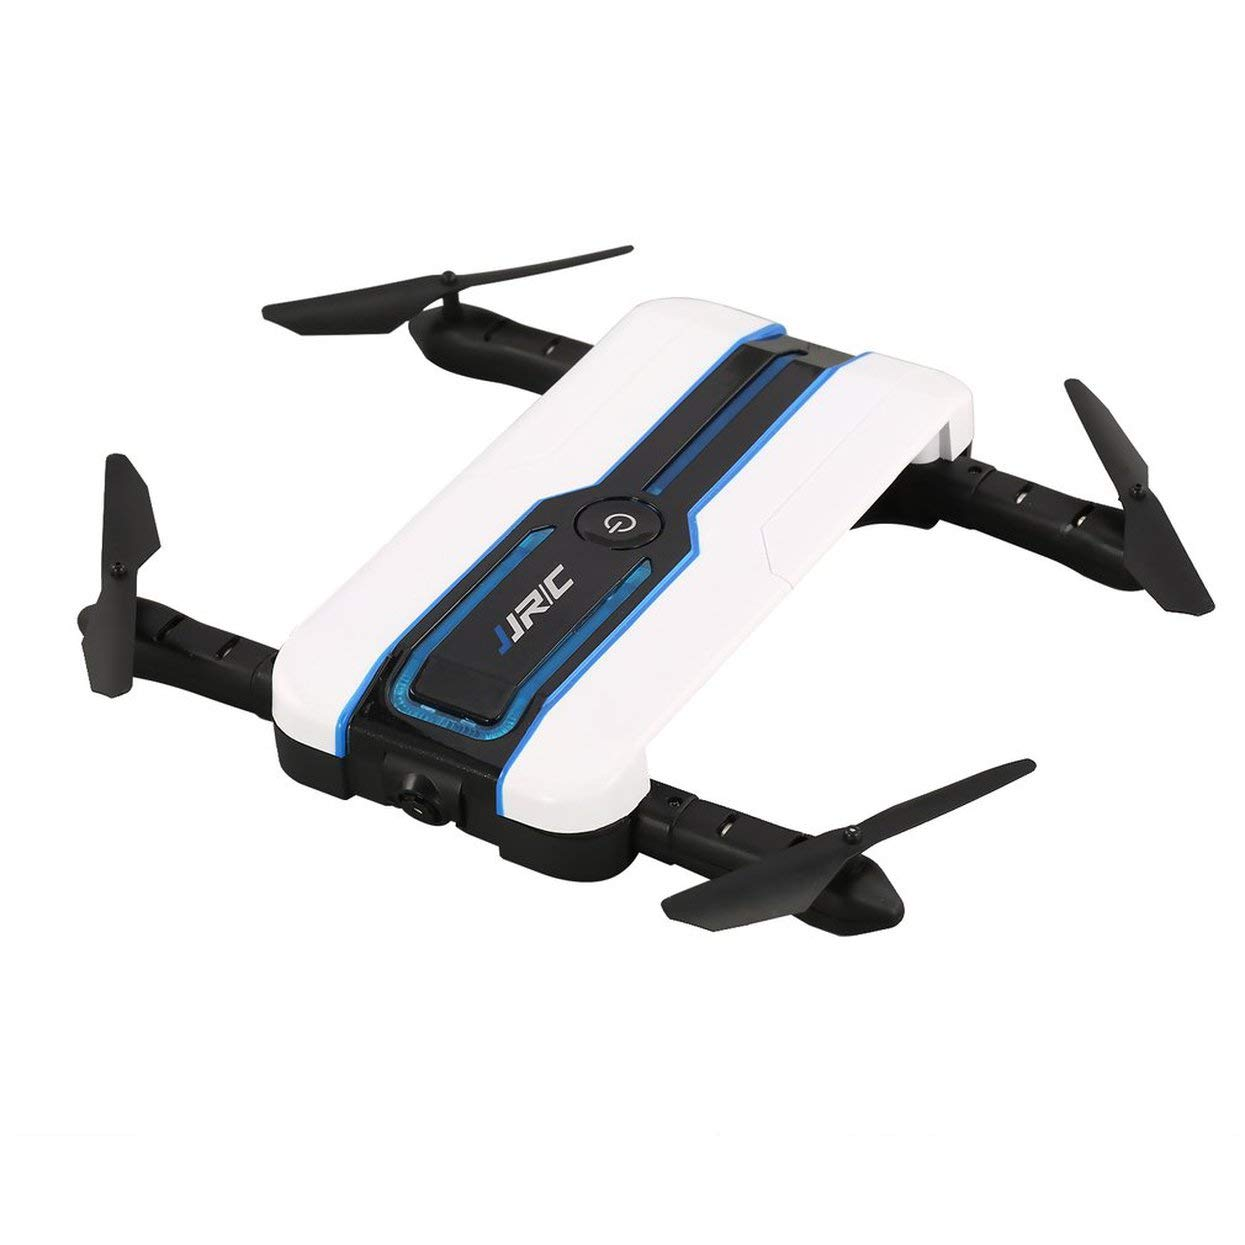 JJR/C H61 Wifi FPV 720 P HD Kamera Schönheitsmodus Höhe Halten Headless Modus Flips & Rolls Faltbare Selfie RC Drone Quadcopter